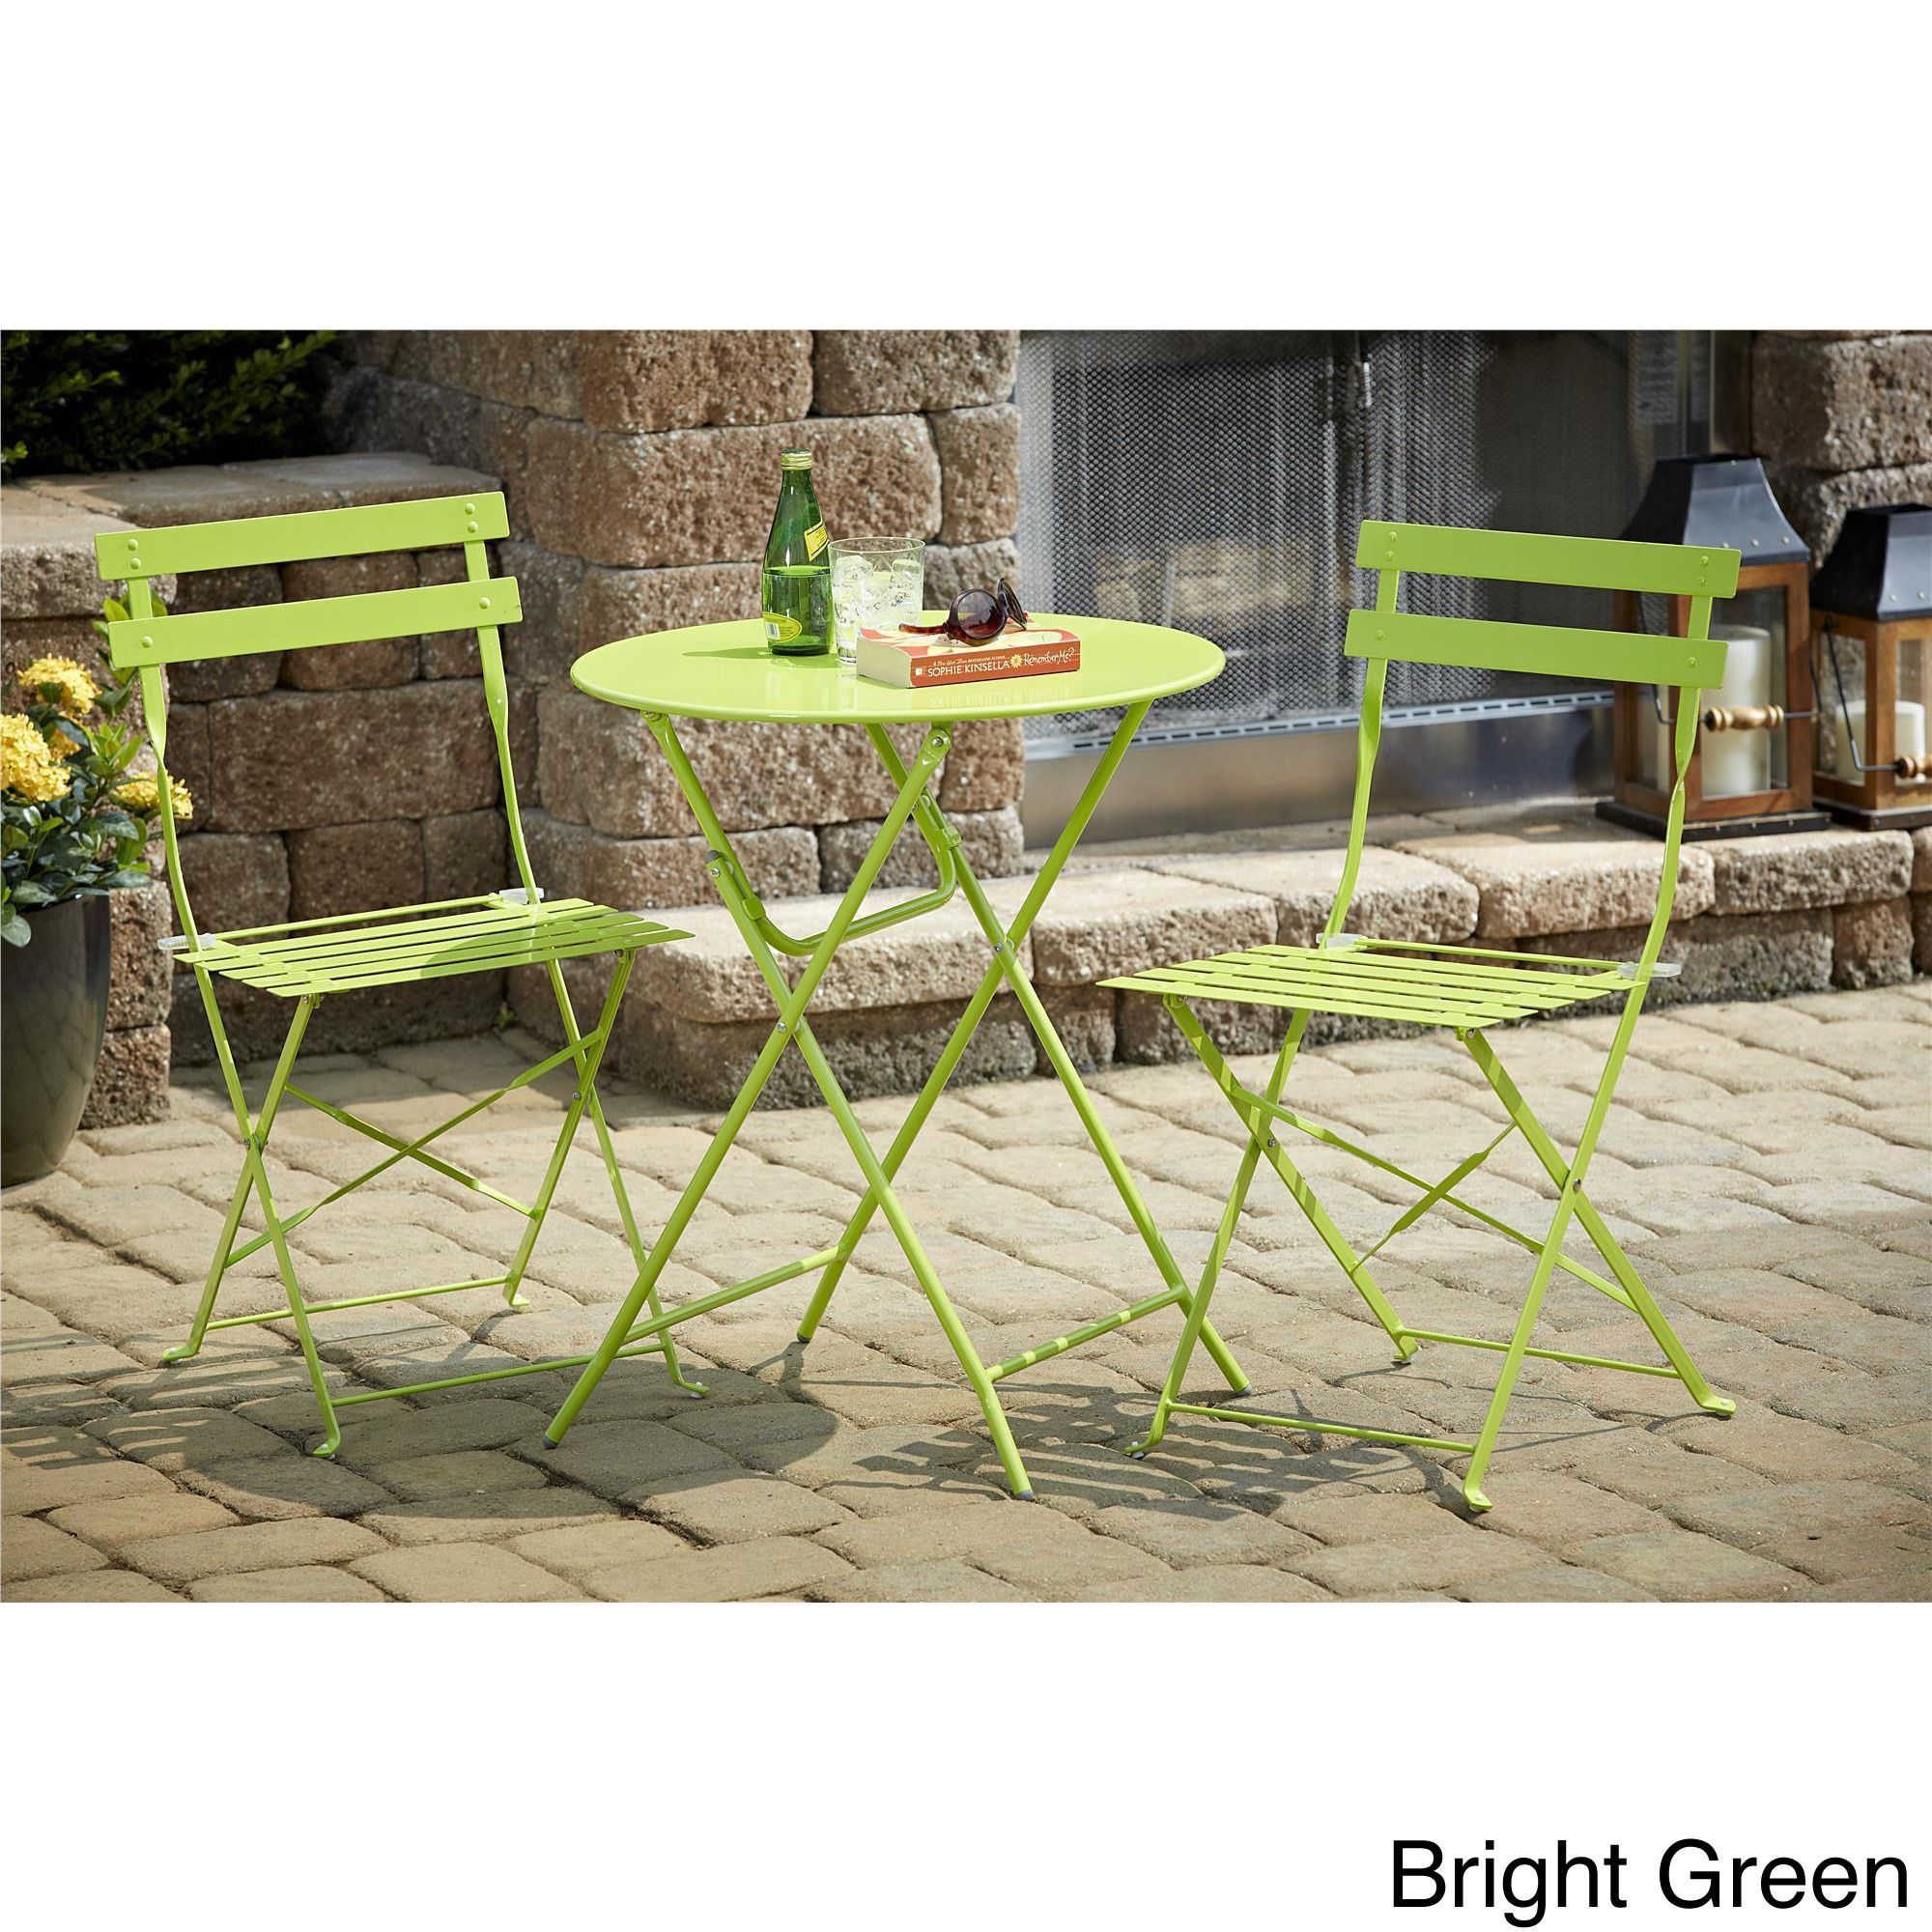 Cosco 3 Piece Folding Bistro Set Bright Green Patio Furniture